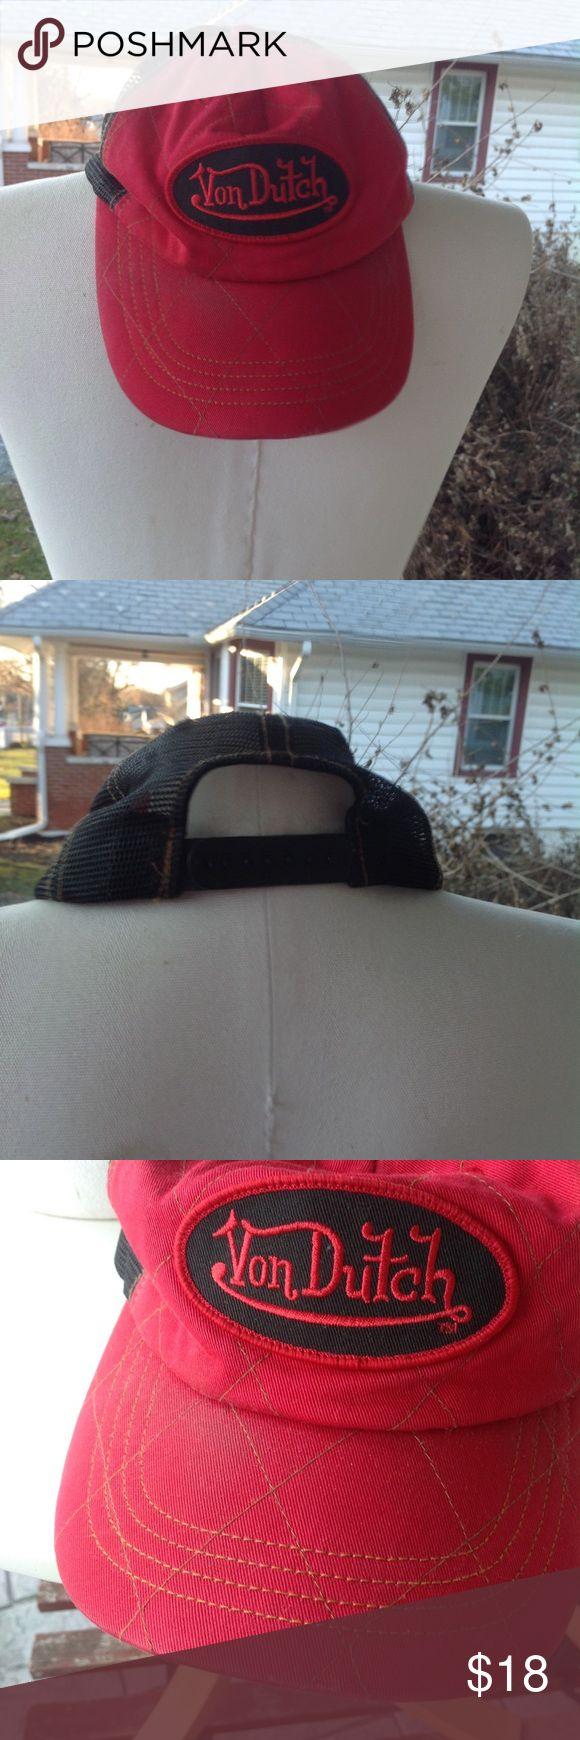 Mens von Dutch hat. One size, red and black, slight stains on front and on inside, a little worn. Von Dutch Accessories Hats